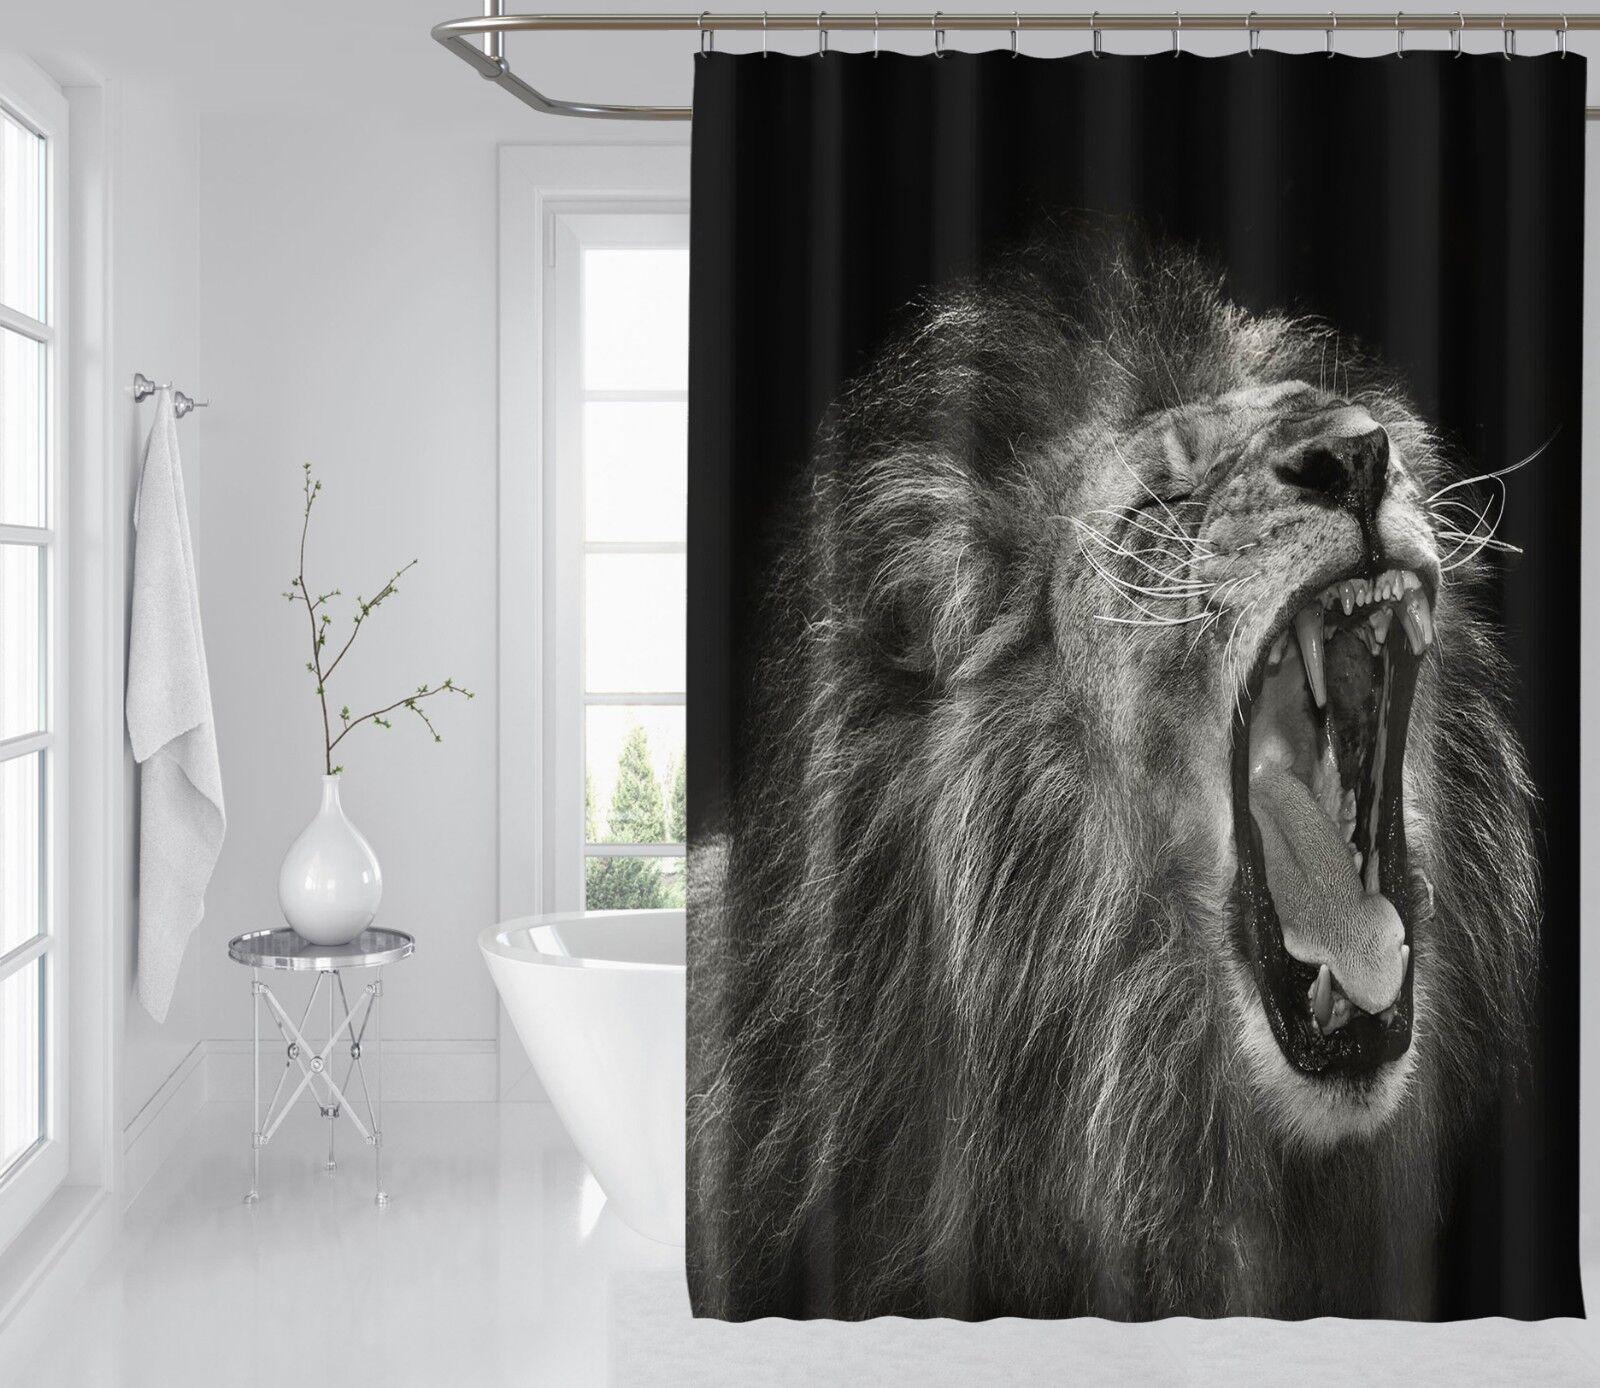 3D Howl Lion Art 87 Shower Curtain Waterproof Fiber Bathroom Windows Toilet